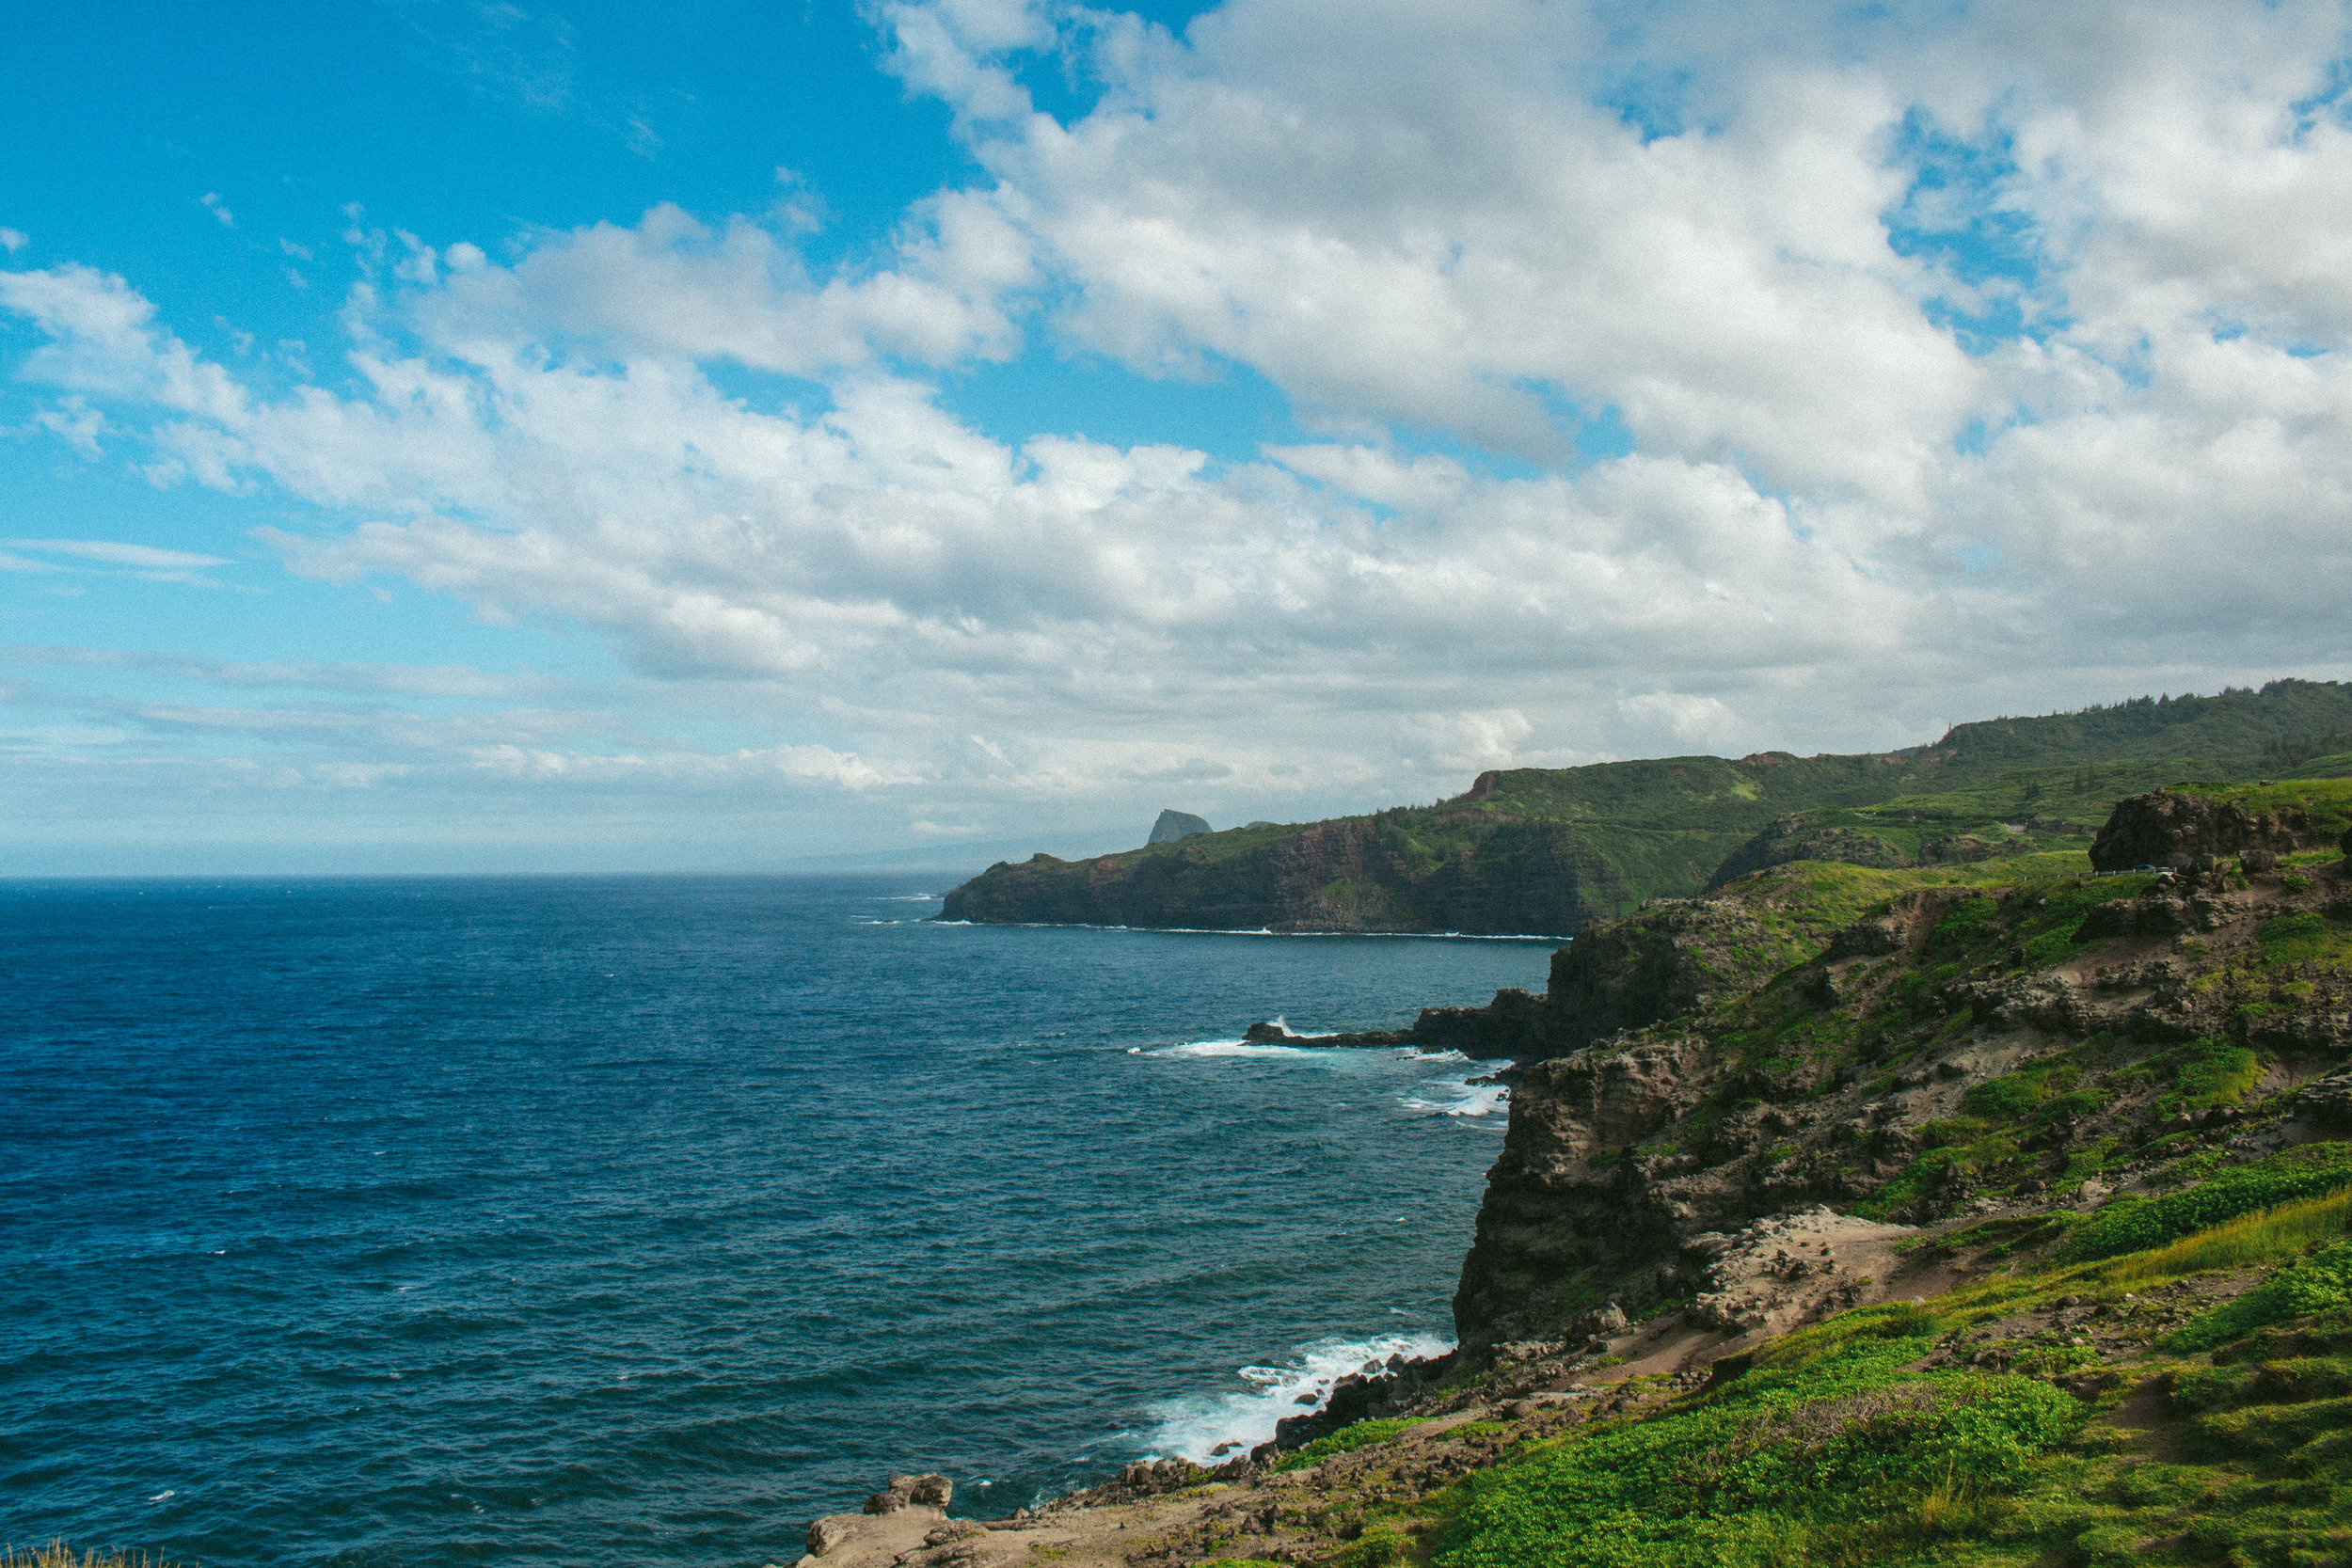 Hawaii October 2018-compressed-13.jpg